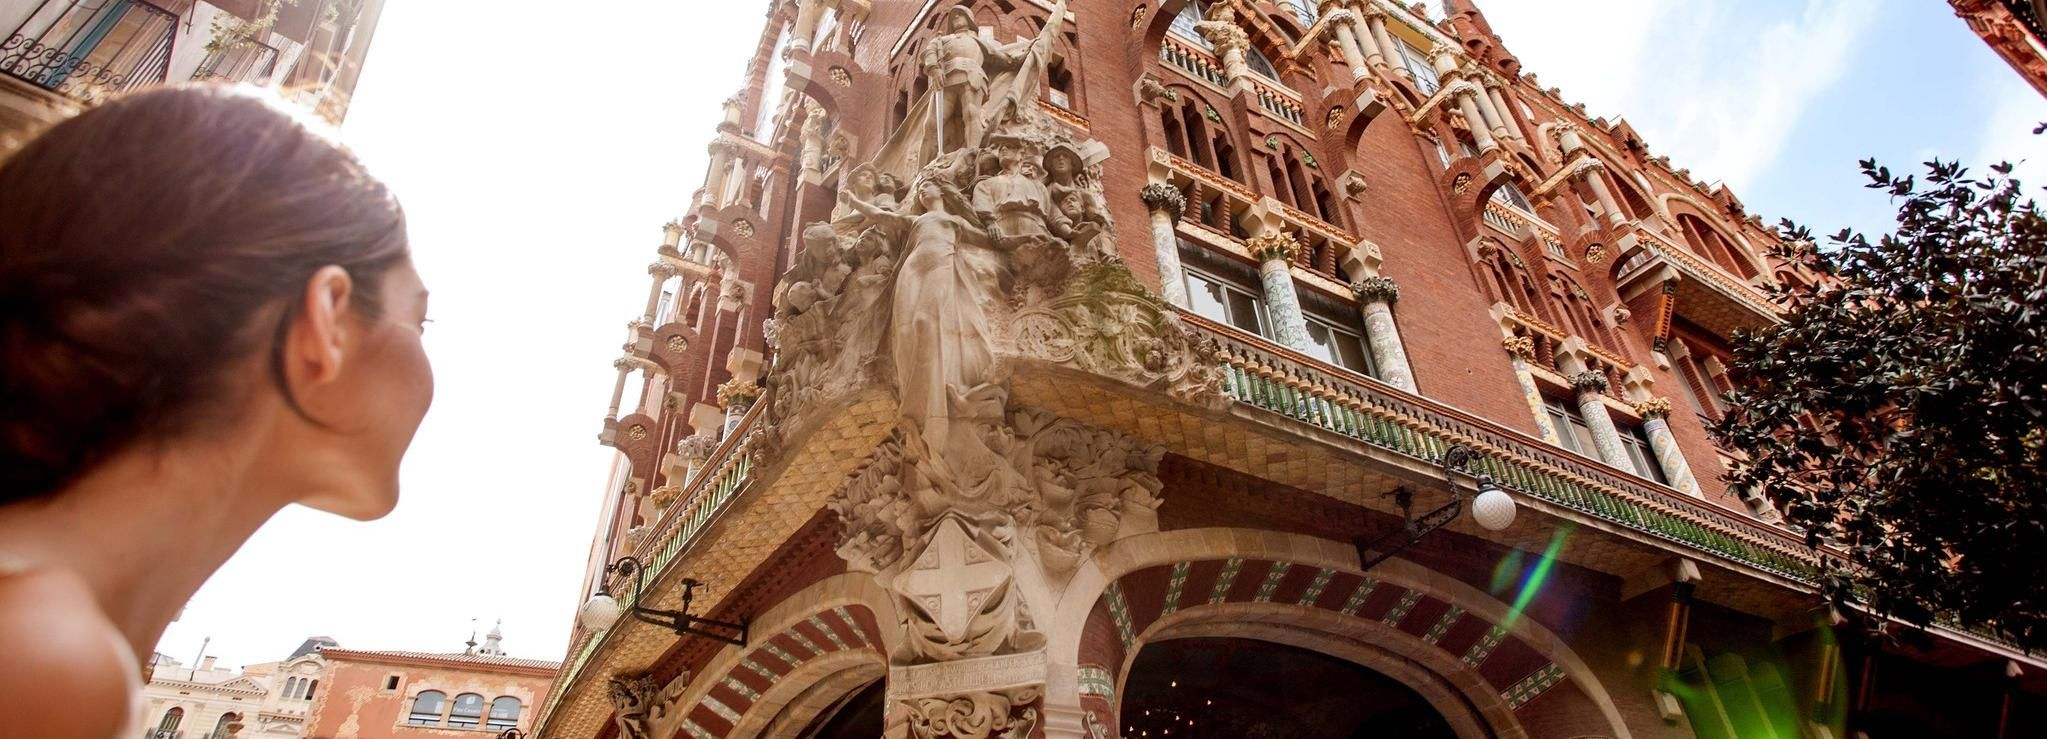 Barcellona: tour guidato al Palau de la Música